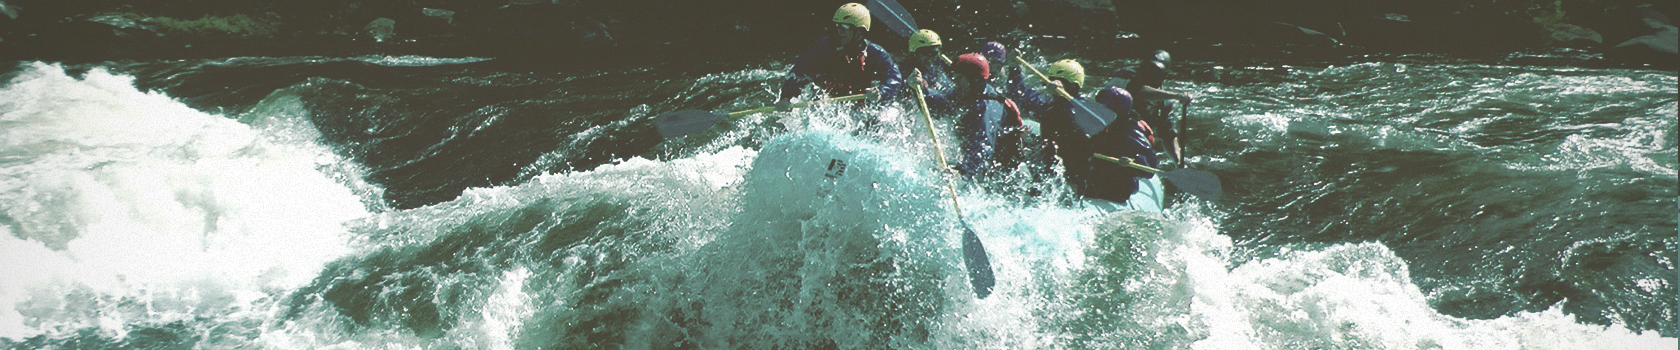 rafting copy